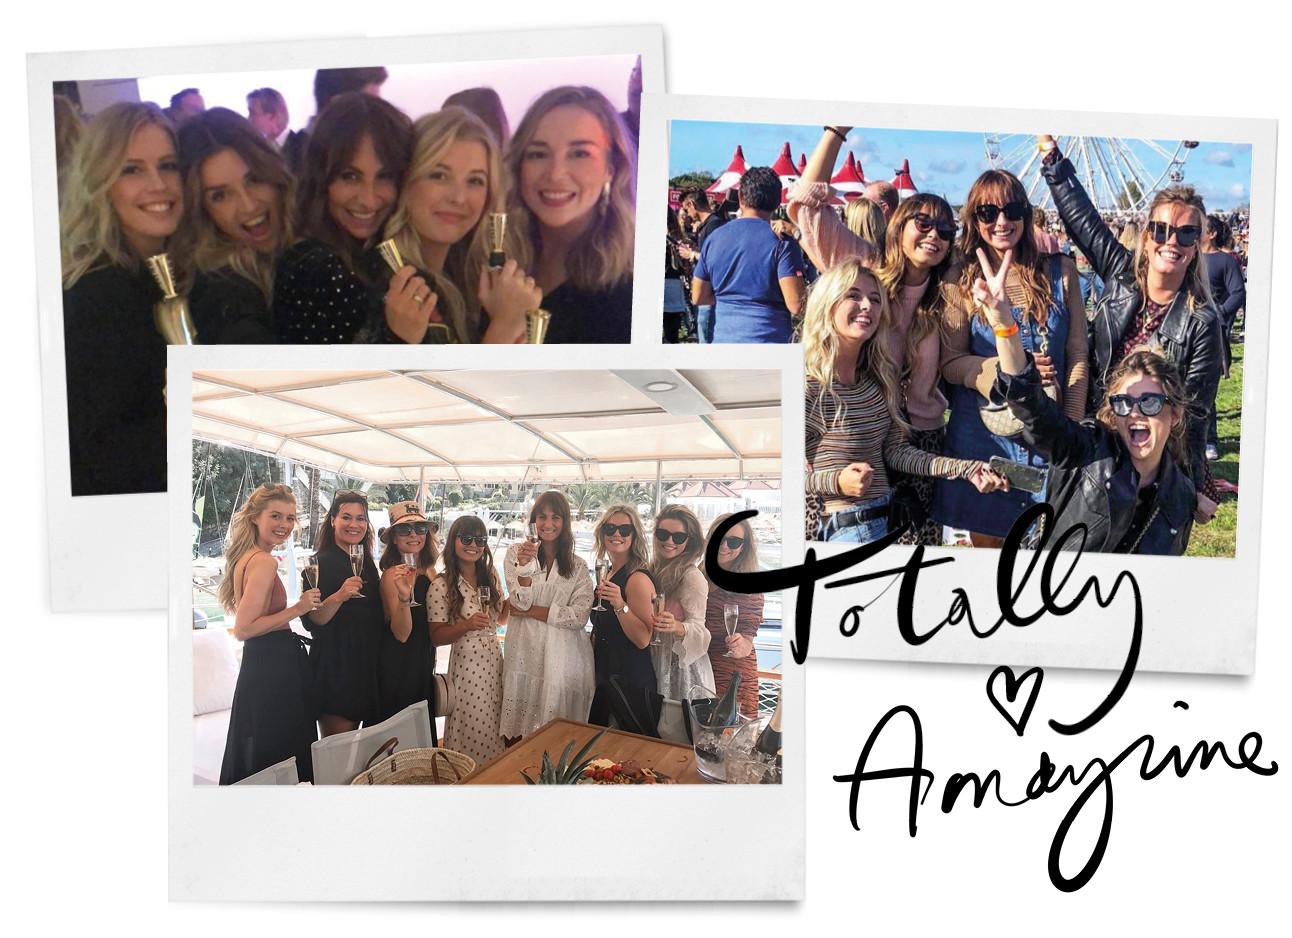 team foto's van het team van amayzine, festival, champagne, vakantie